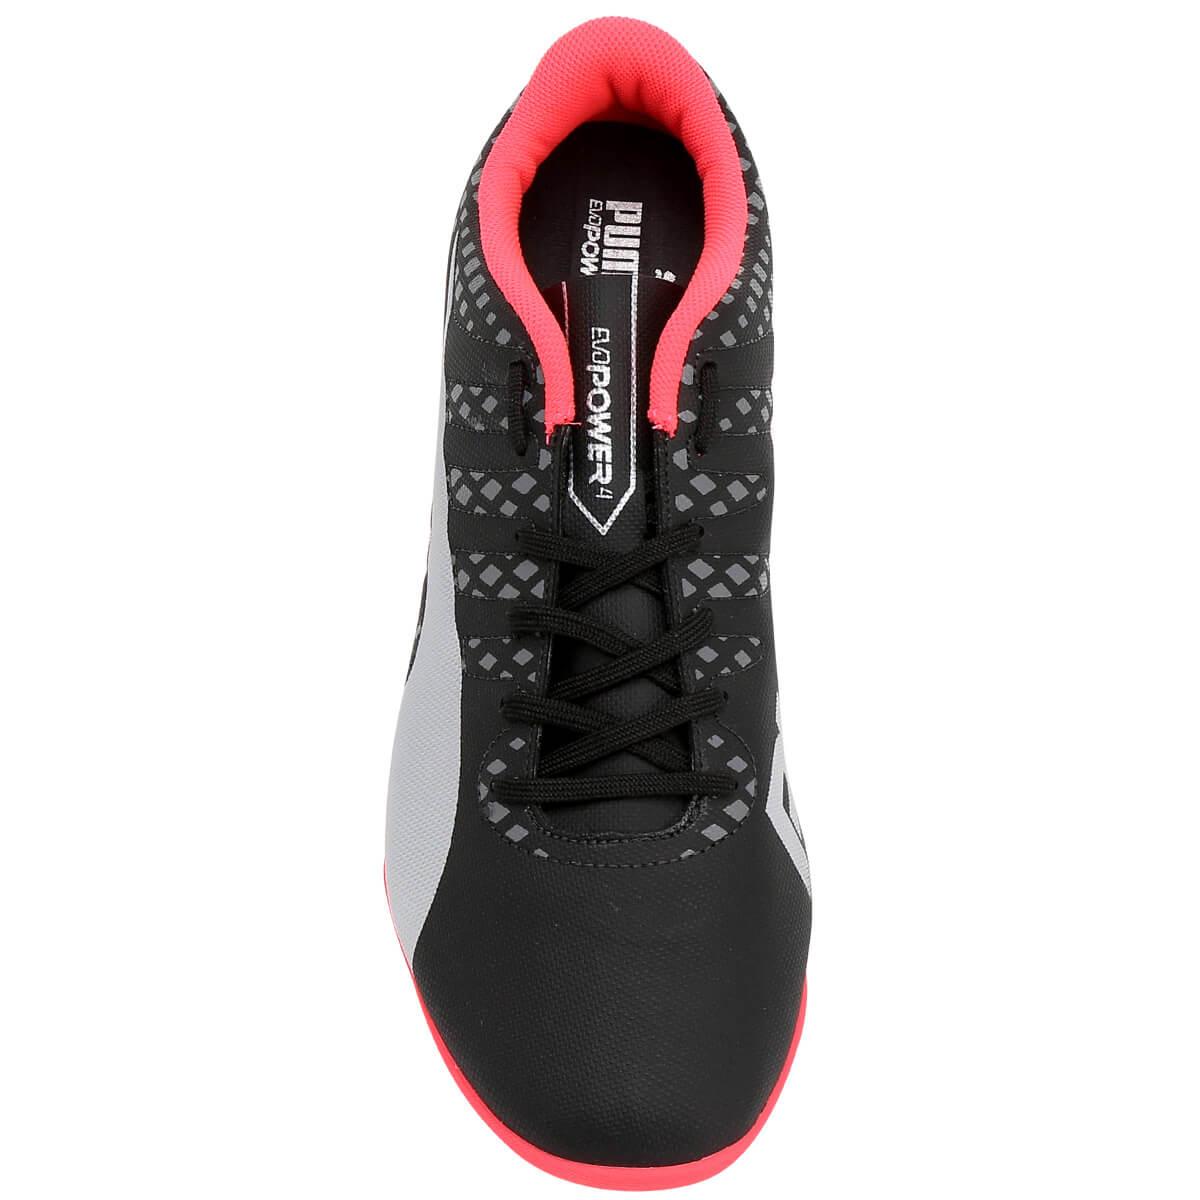 851fd68c538cc ... Chuteira Puma Evopower Vigor 4 Futsal ...